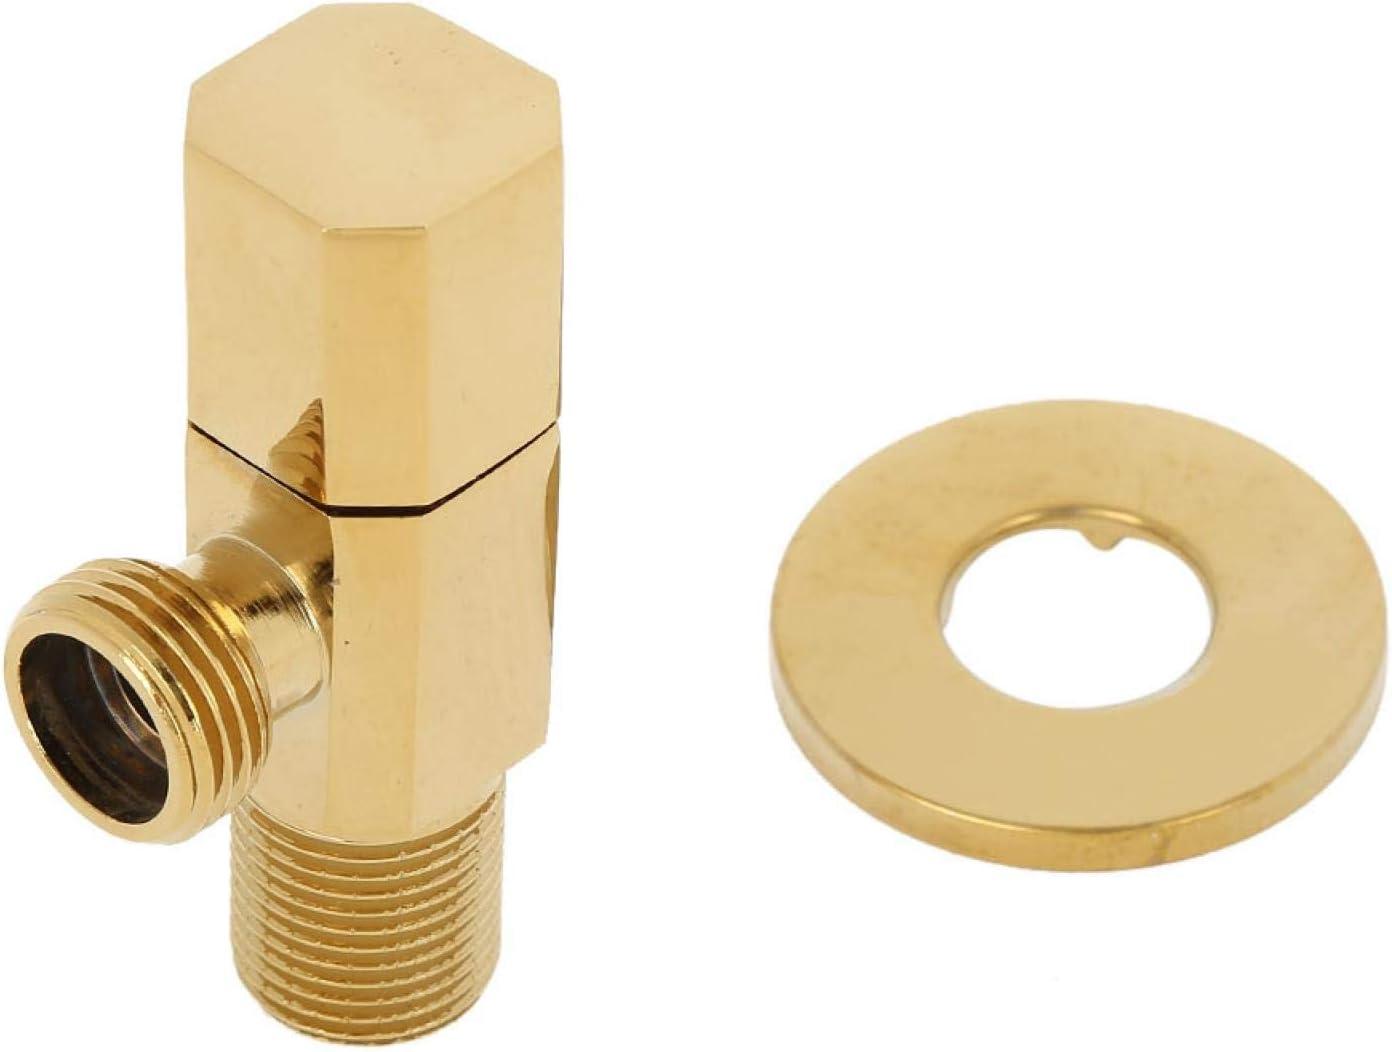 Niiyen Kuuleyn Tap Angle Valve Brass Water Max 49% OFF Fa Hot Cold Shut Off Dealing full price reduction